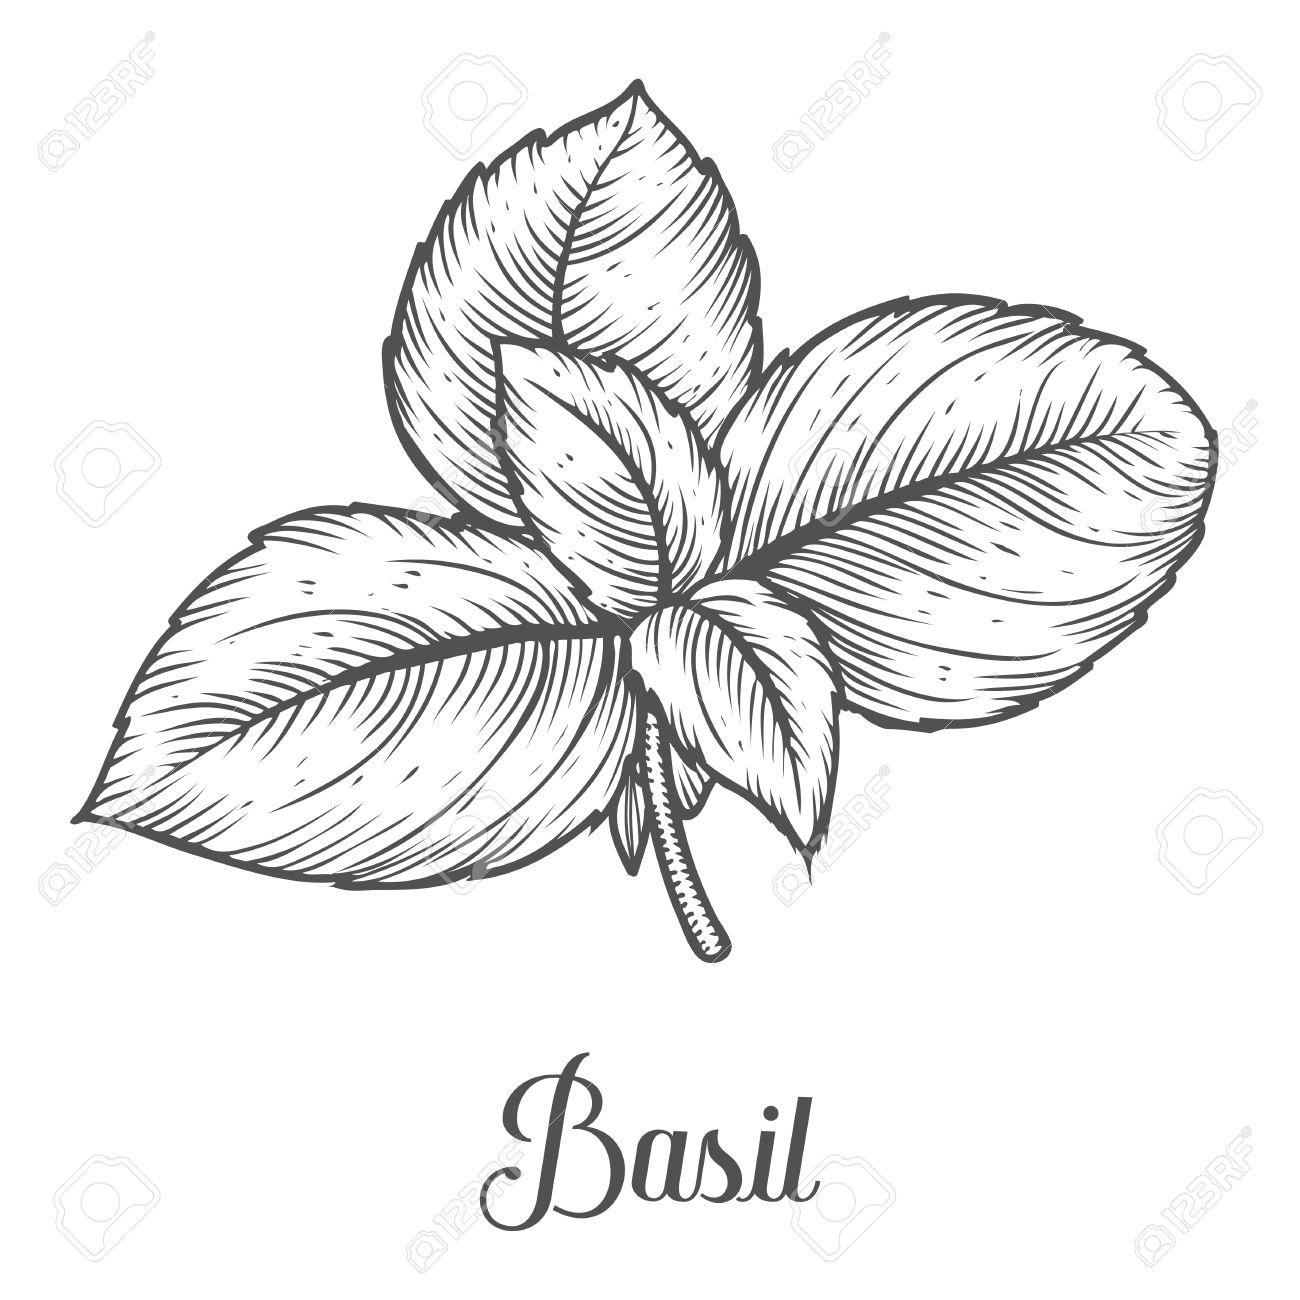 1300x1300 Basil Fresh Herb Leaves Plant Vector Hand Drawn Illustration